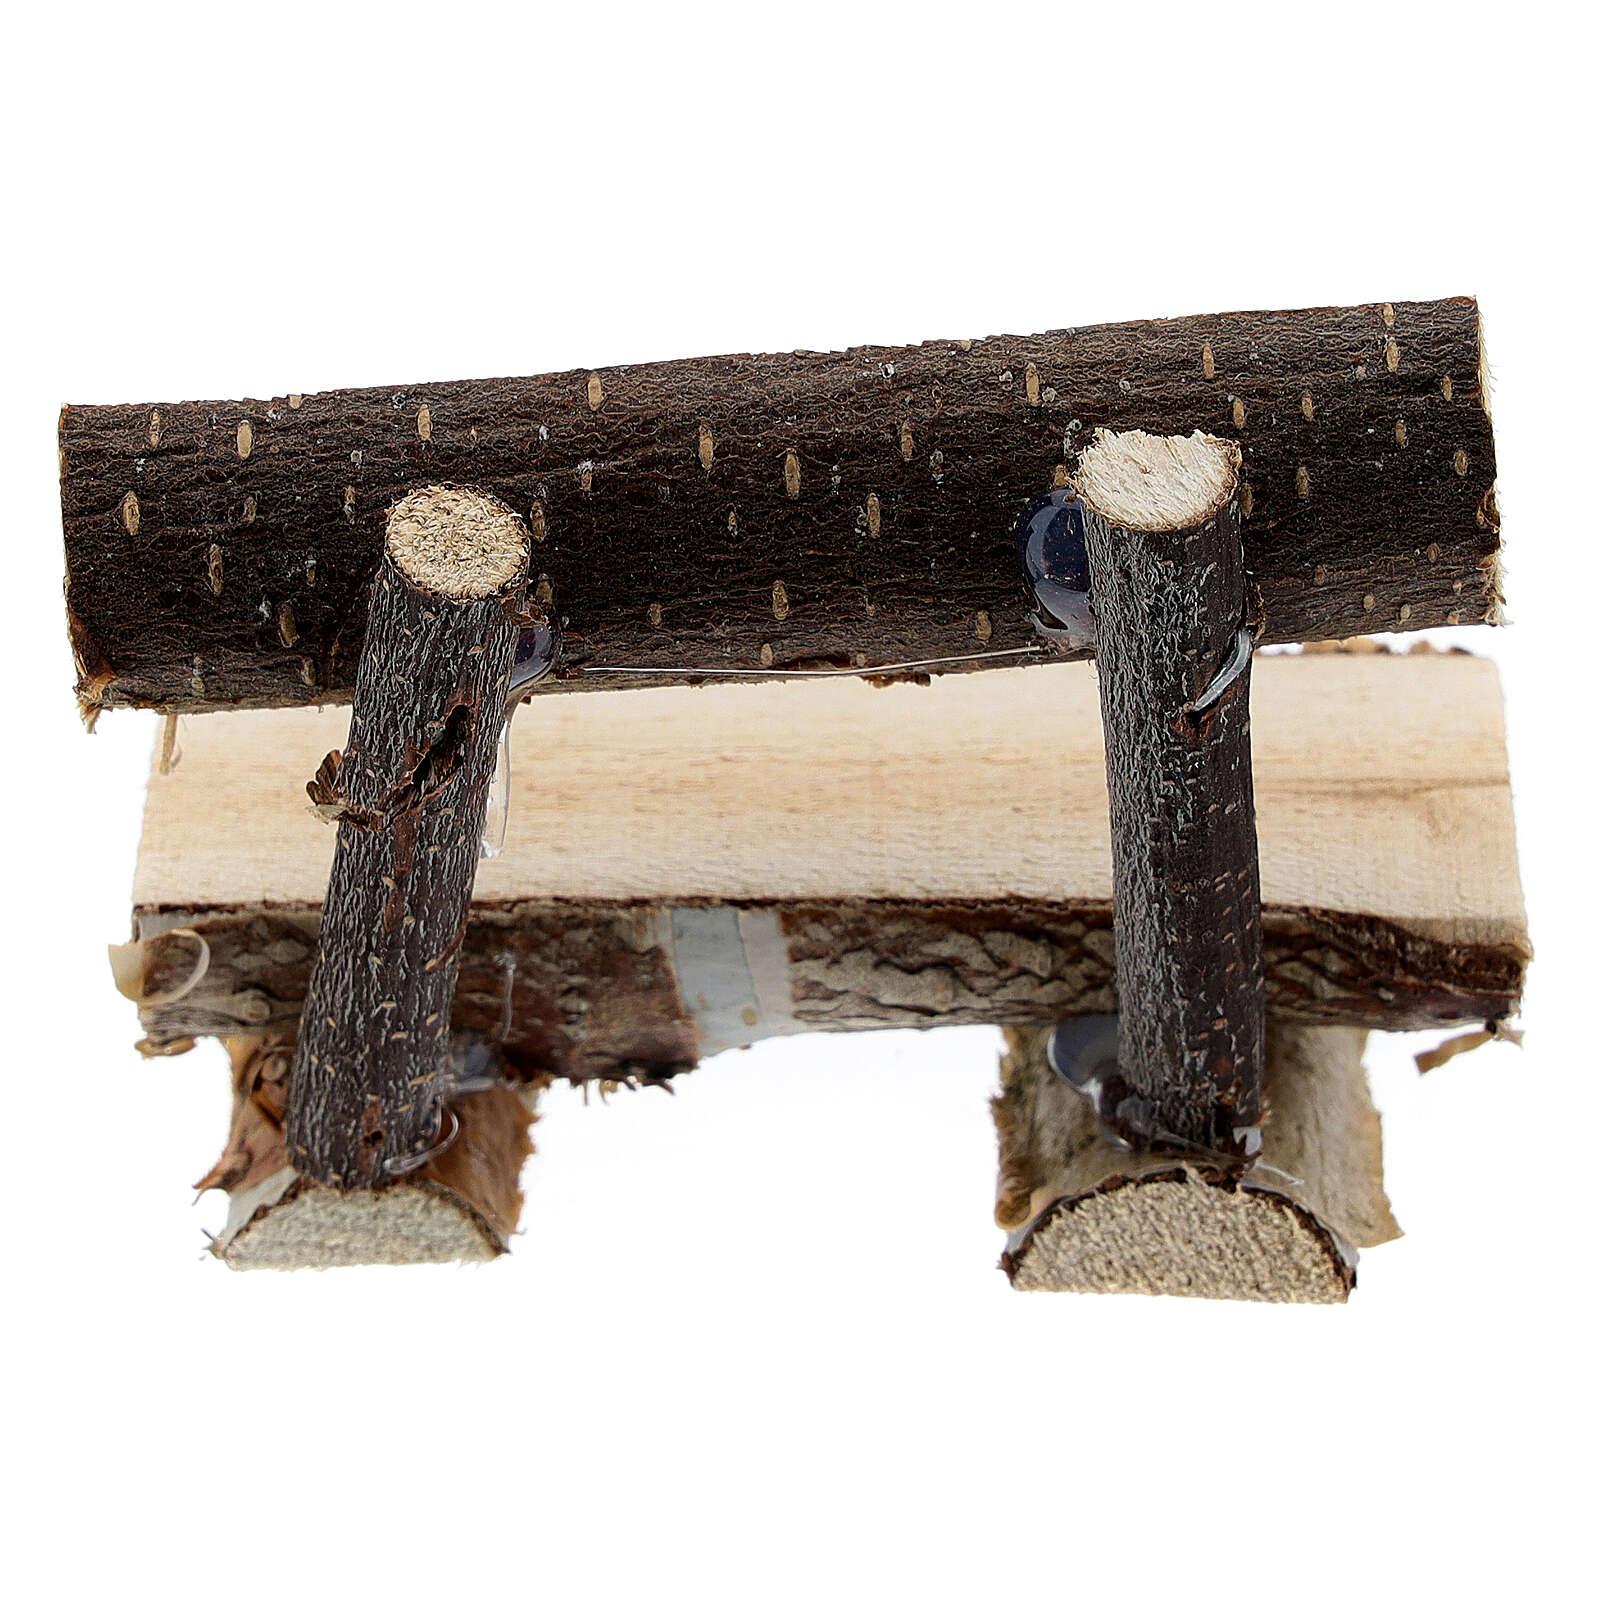 Banco tronco árbol belén 8 cm 4